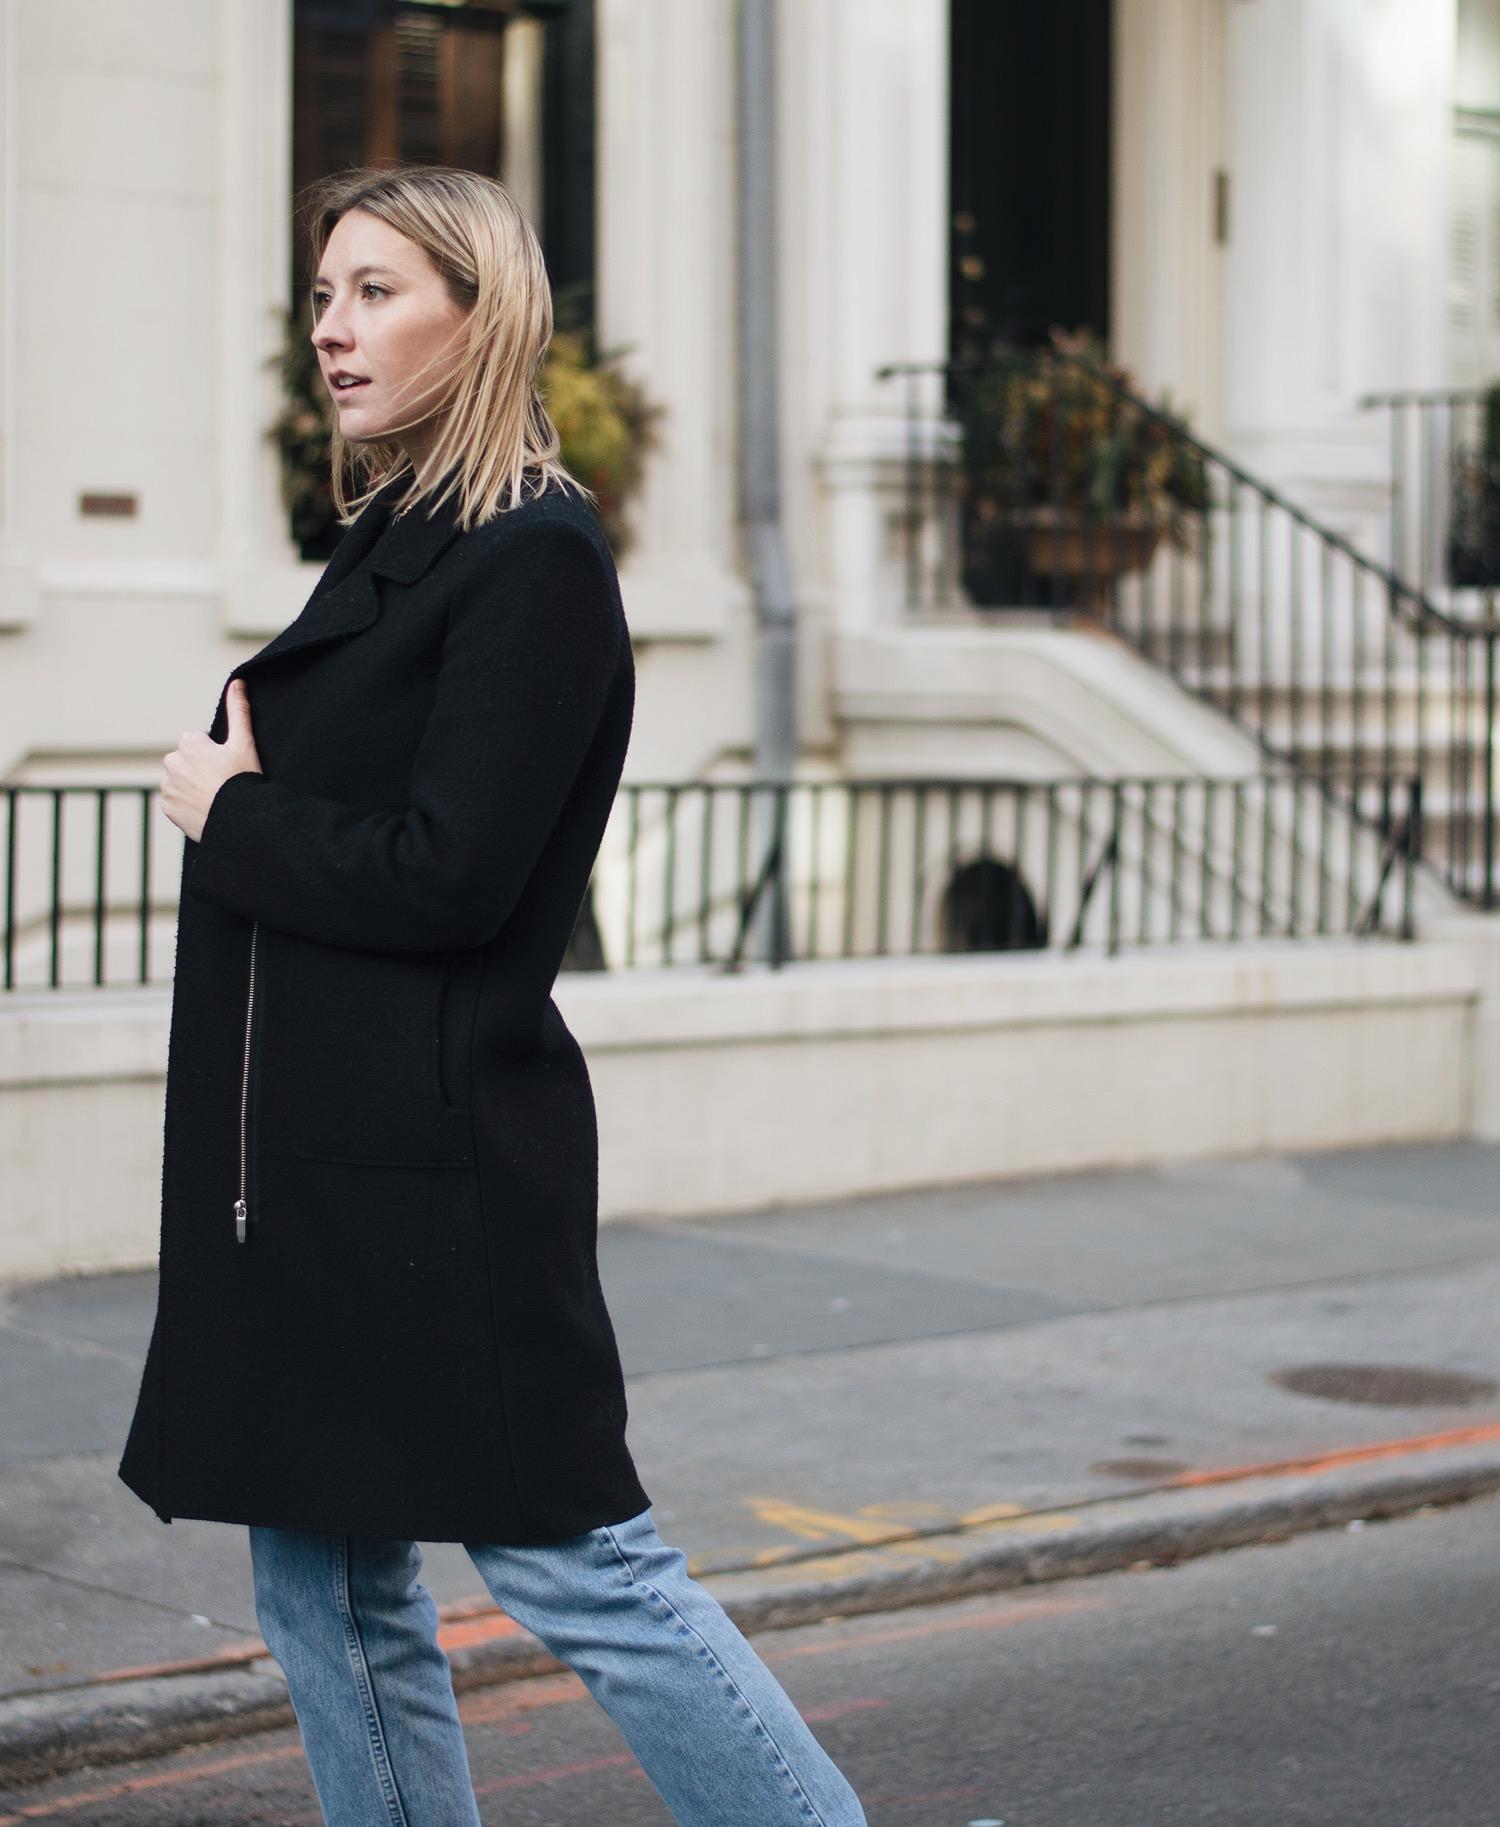 Zara Felt Coat (similar  here  +  here ), Vintage Denim (similar  here  +  here ),  J. Crew Perfect Fit Long Sleeve Tee ,  Dolce Vita Ankle Boots  ( on sale )